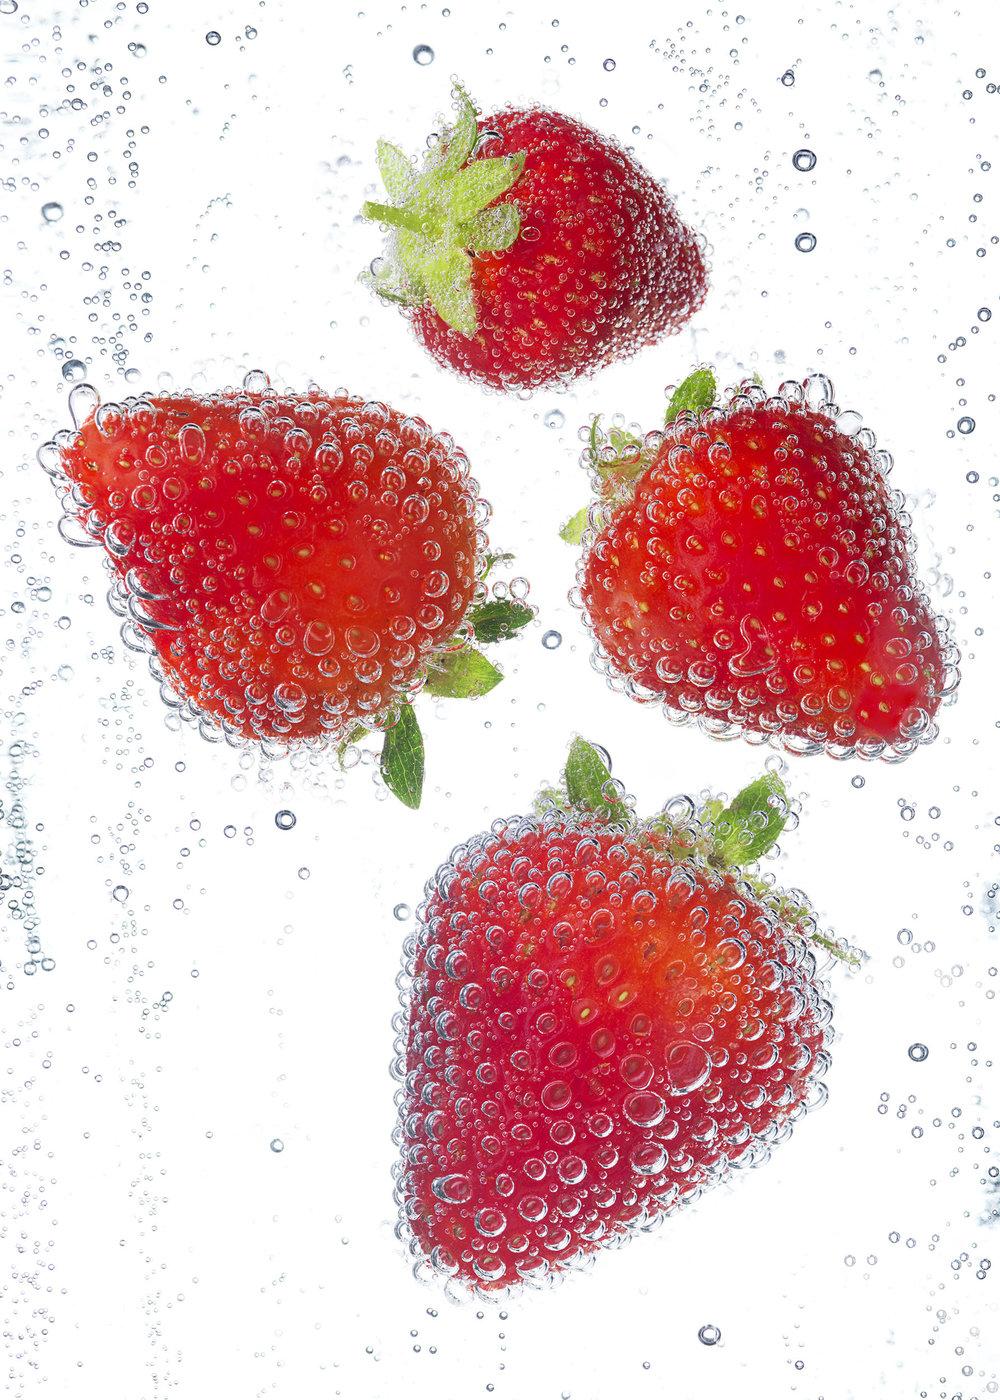 fizzy_strawberries.jpg